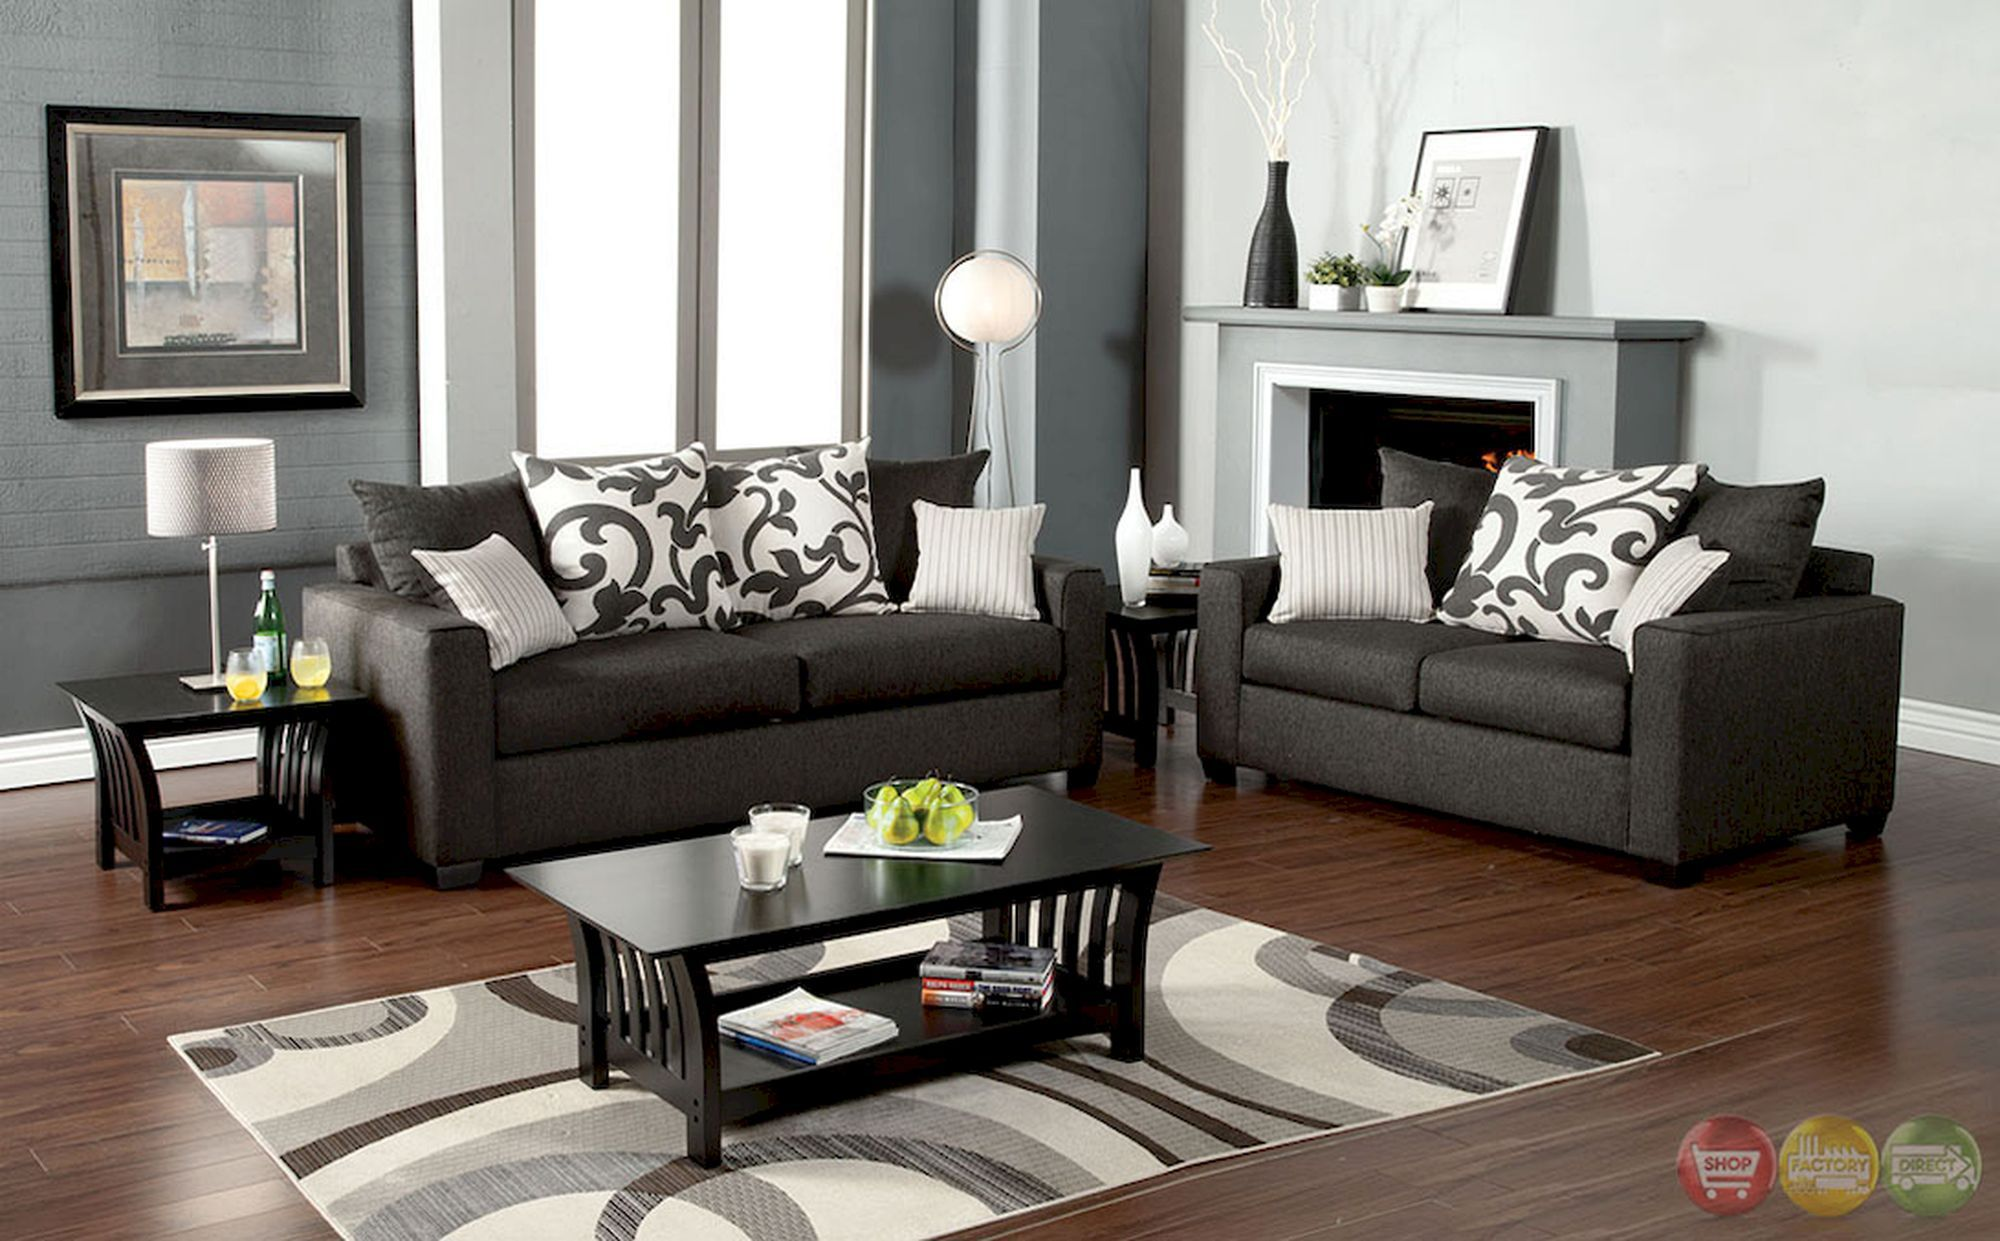 77+ Best Cozy Living Room Pillows  Dream http://freshoom.com/3695-best-cozy-living-room-pillows-collections/